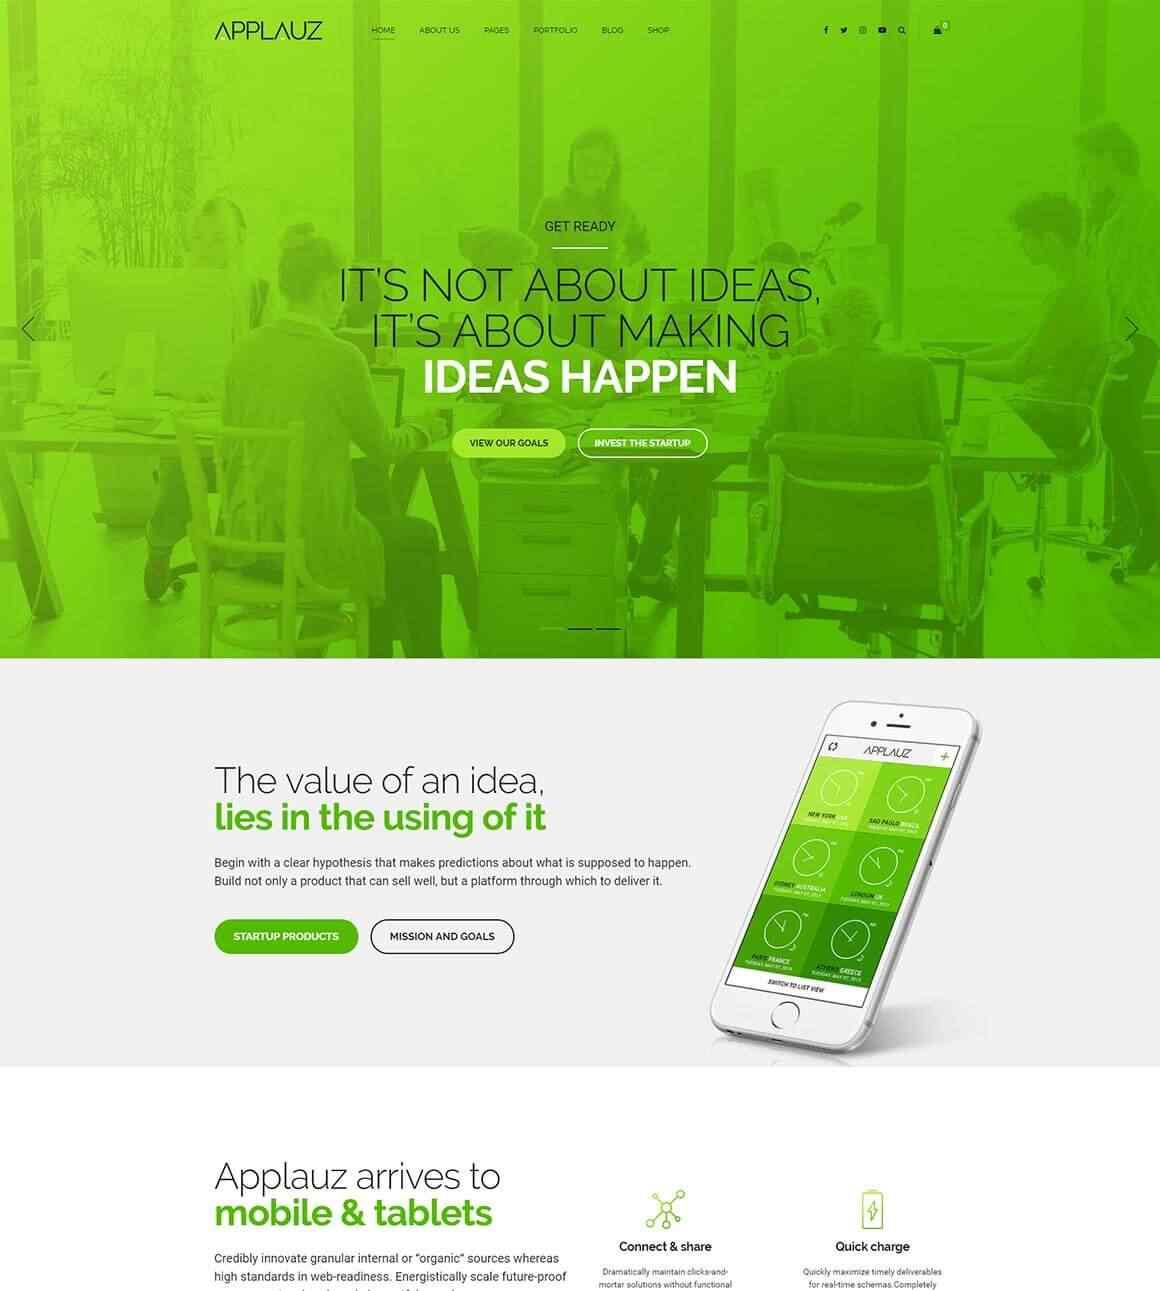 http://evogens.com.tr/wp-content/uploads/2017/11/Screenshot-Startup.jpg